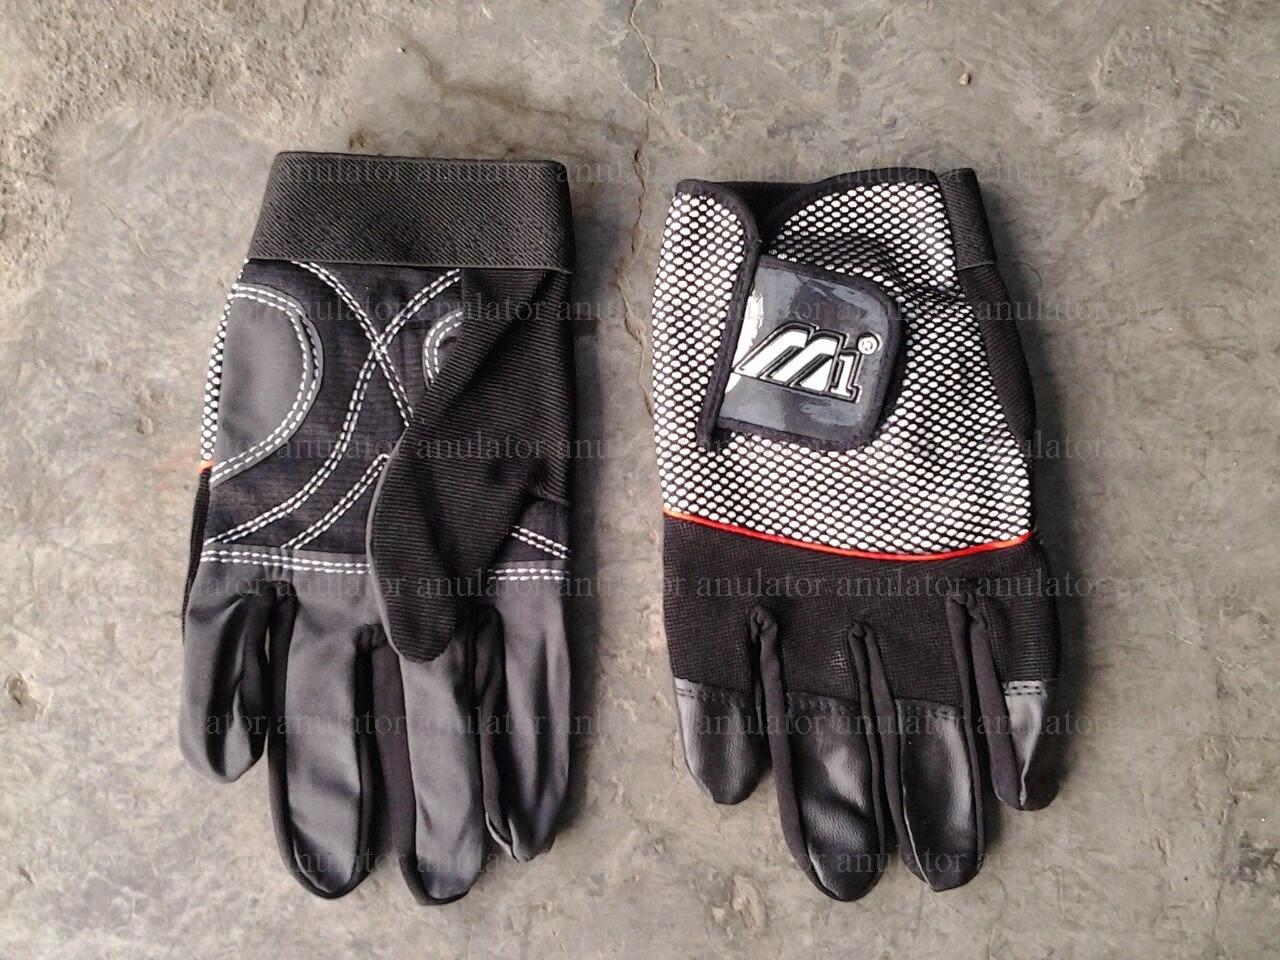 Glove M1 Full